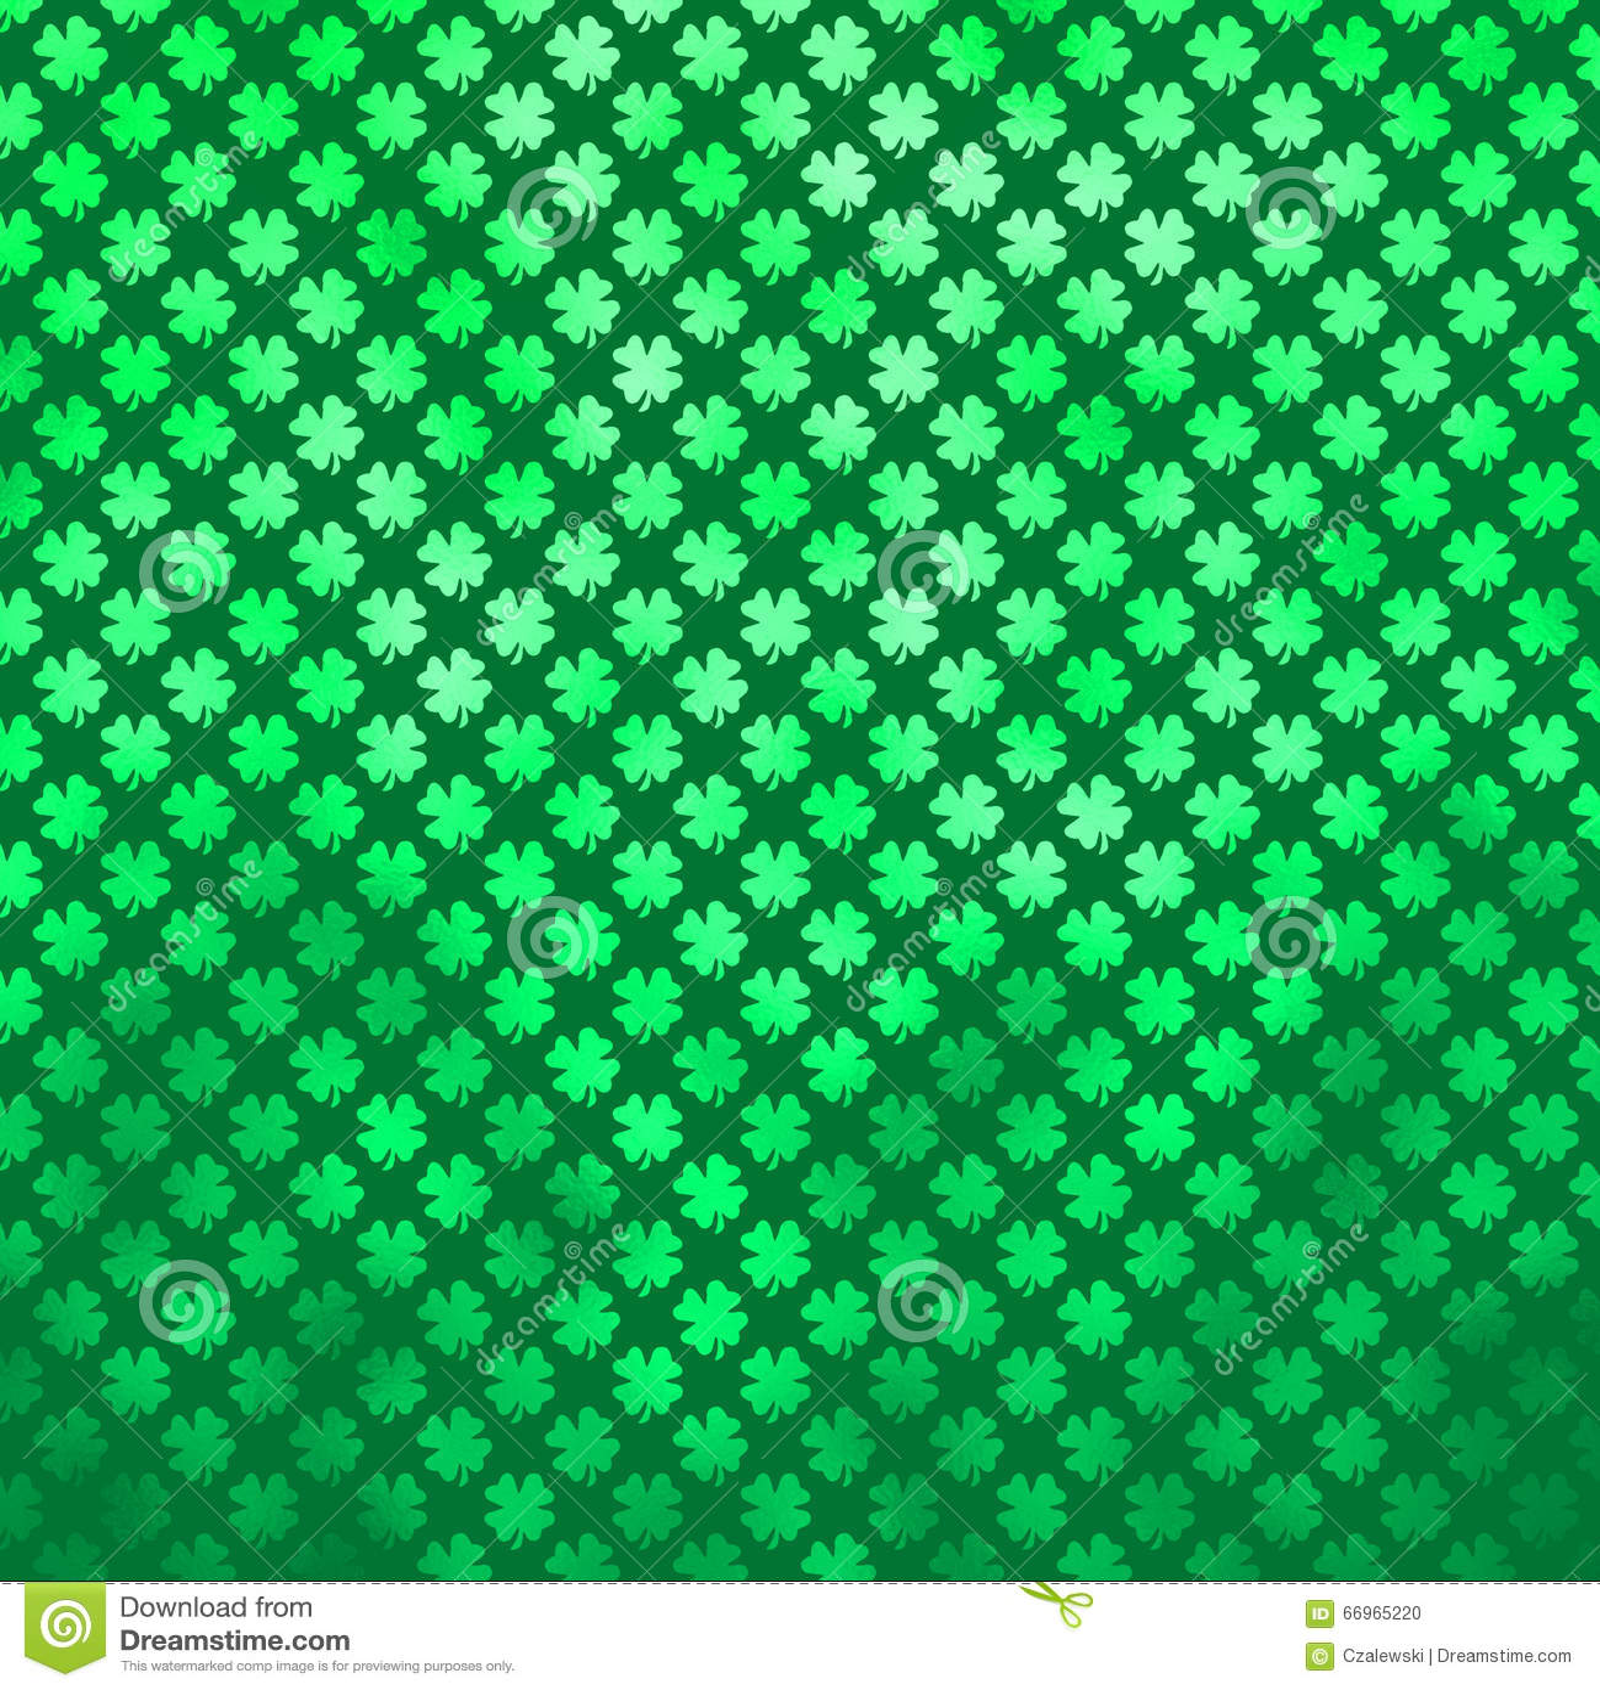 green shamrock four leaf clover st patrick u0027s day irish polka dot